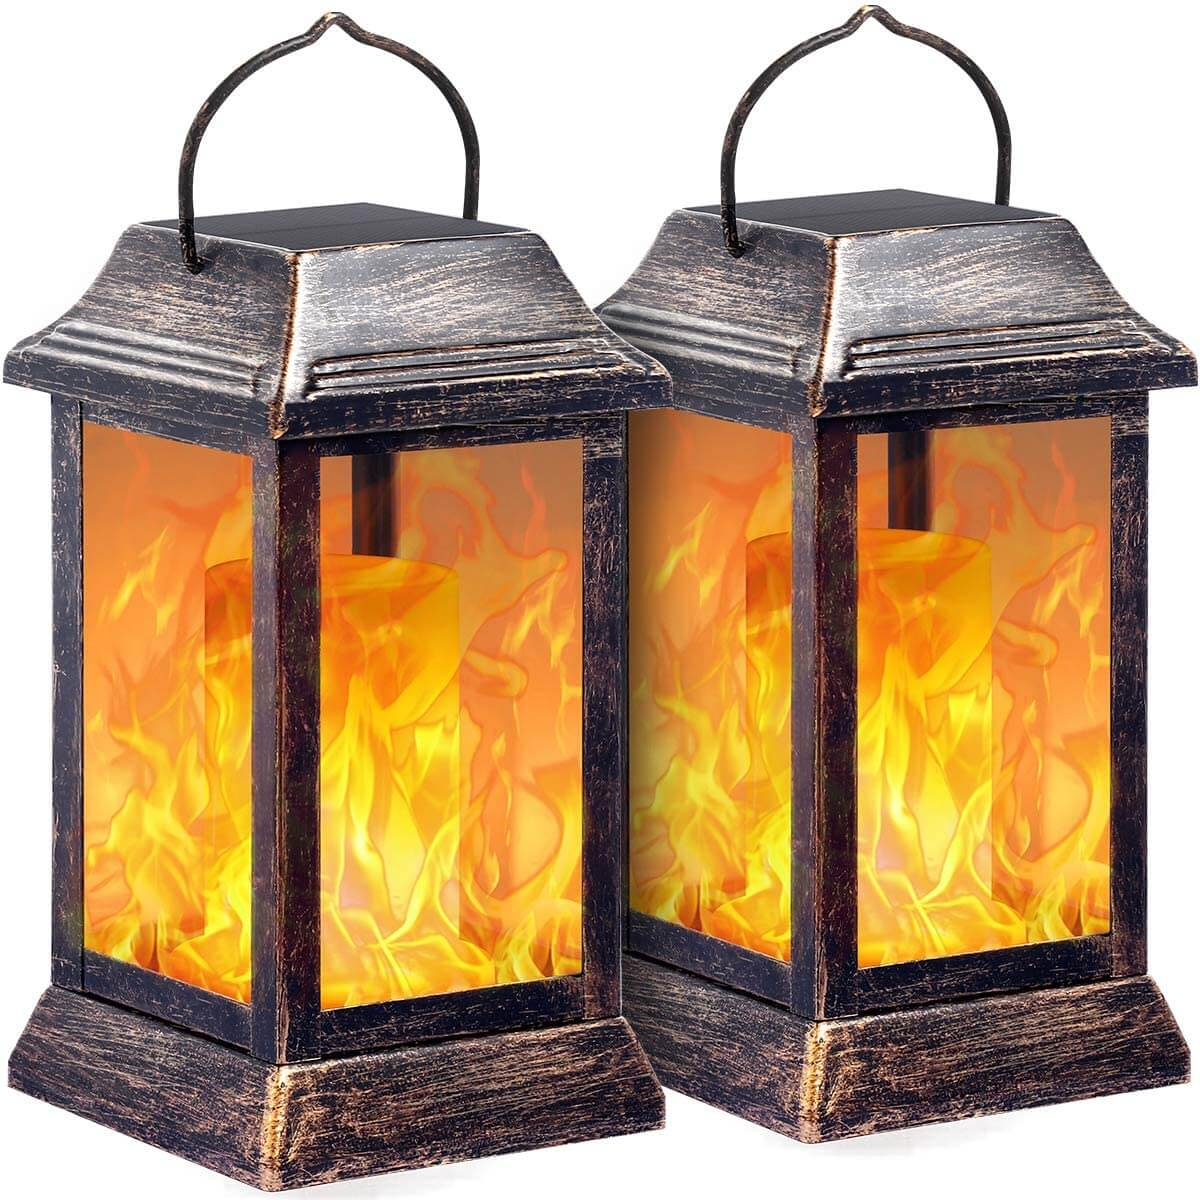 TomCare Metal Flickering Flame Solar Lantern